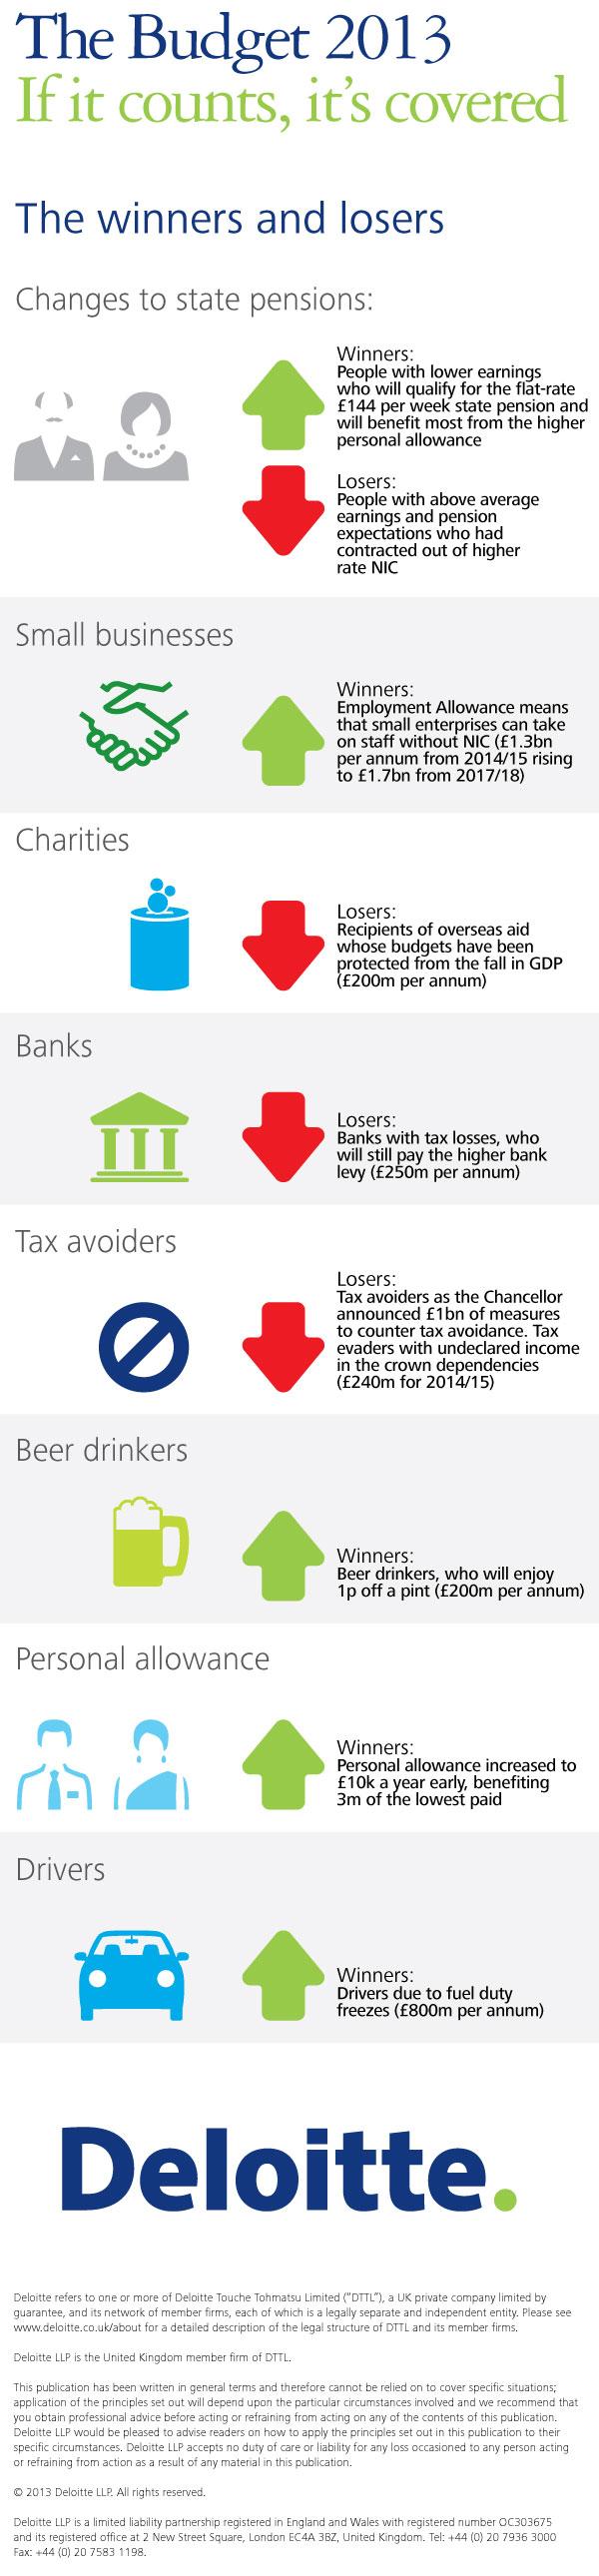 Deloitte - UK Budget